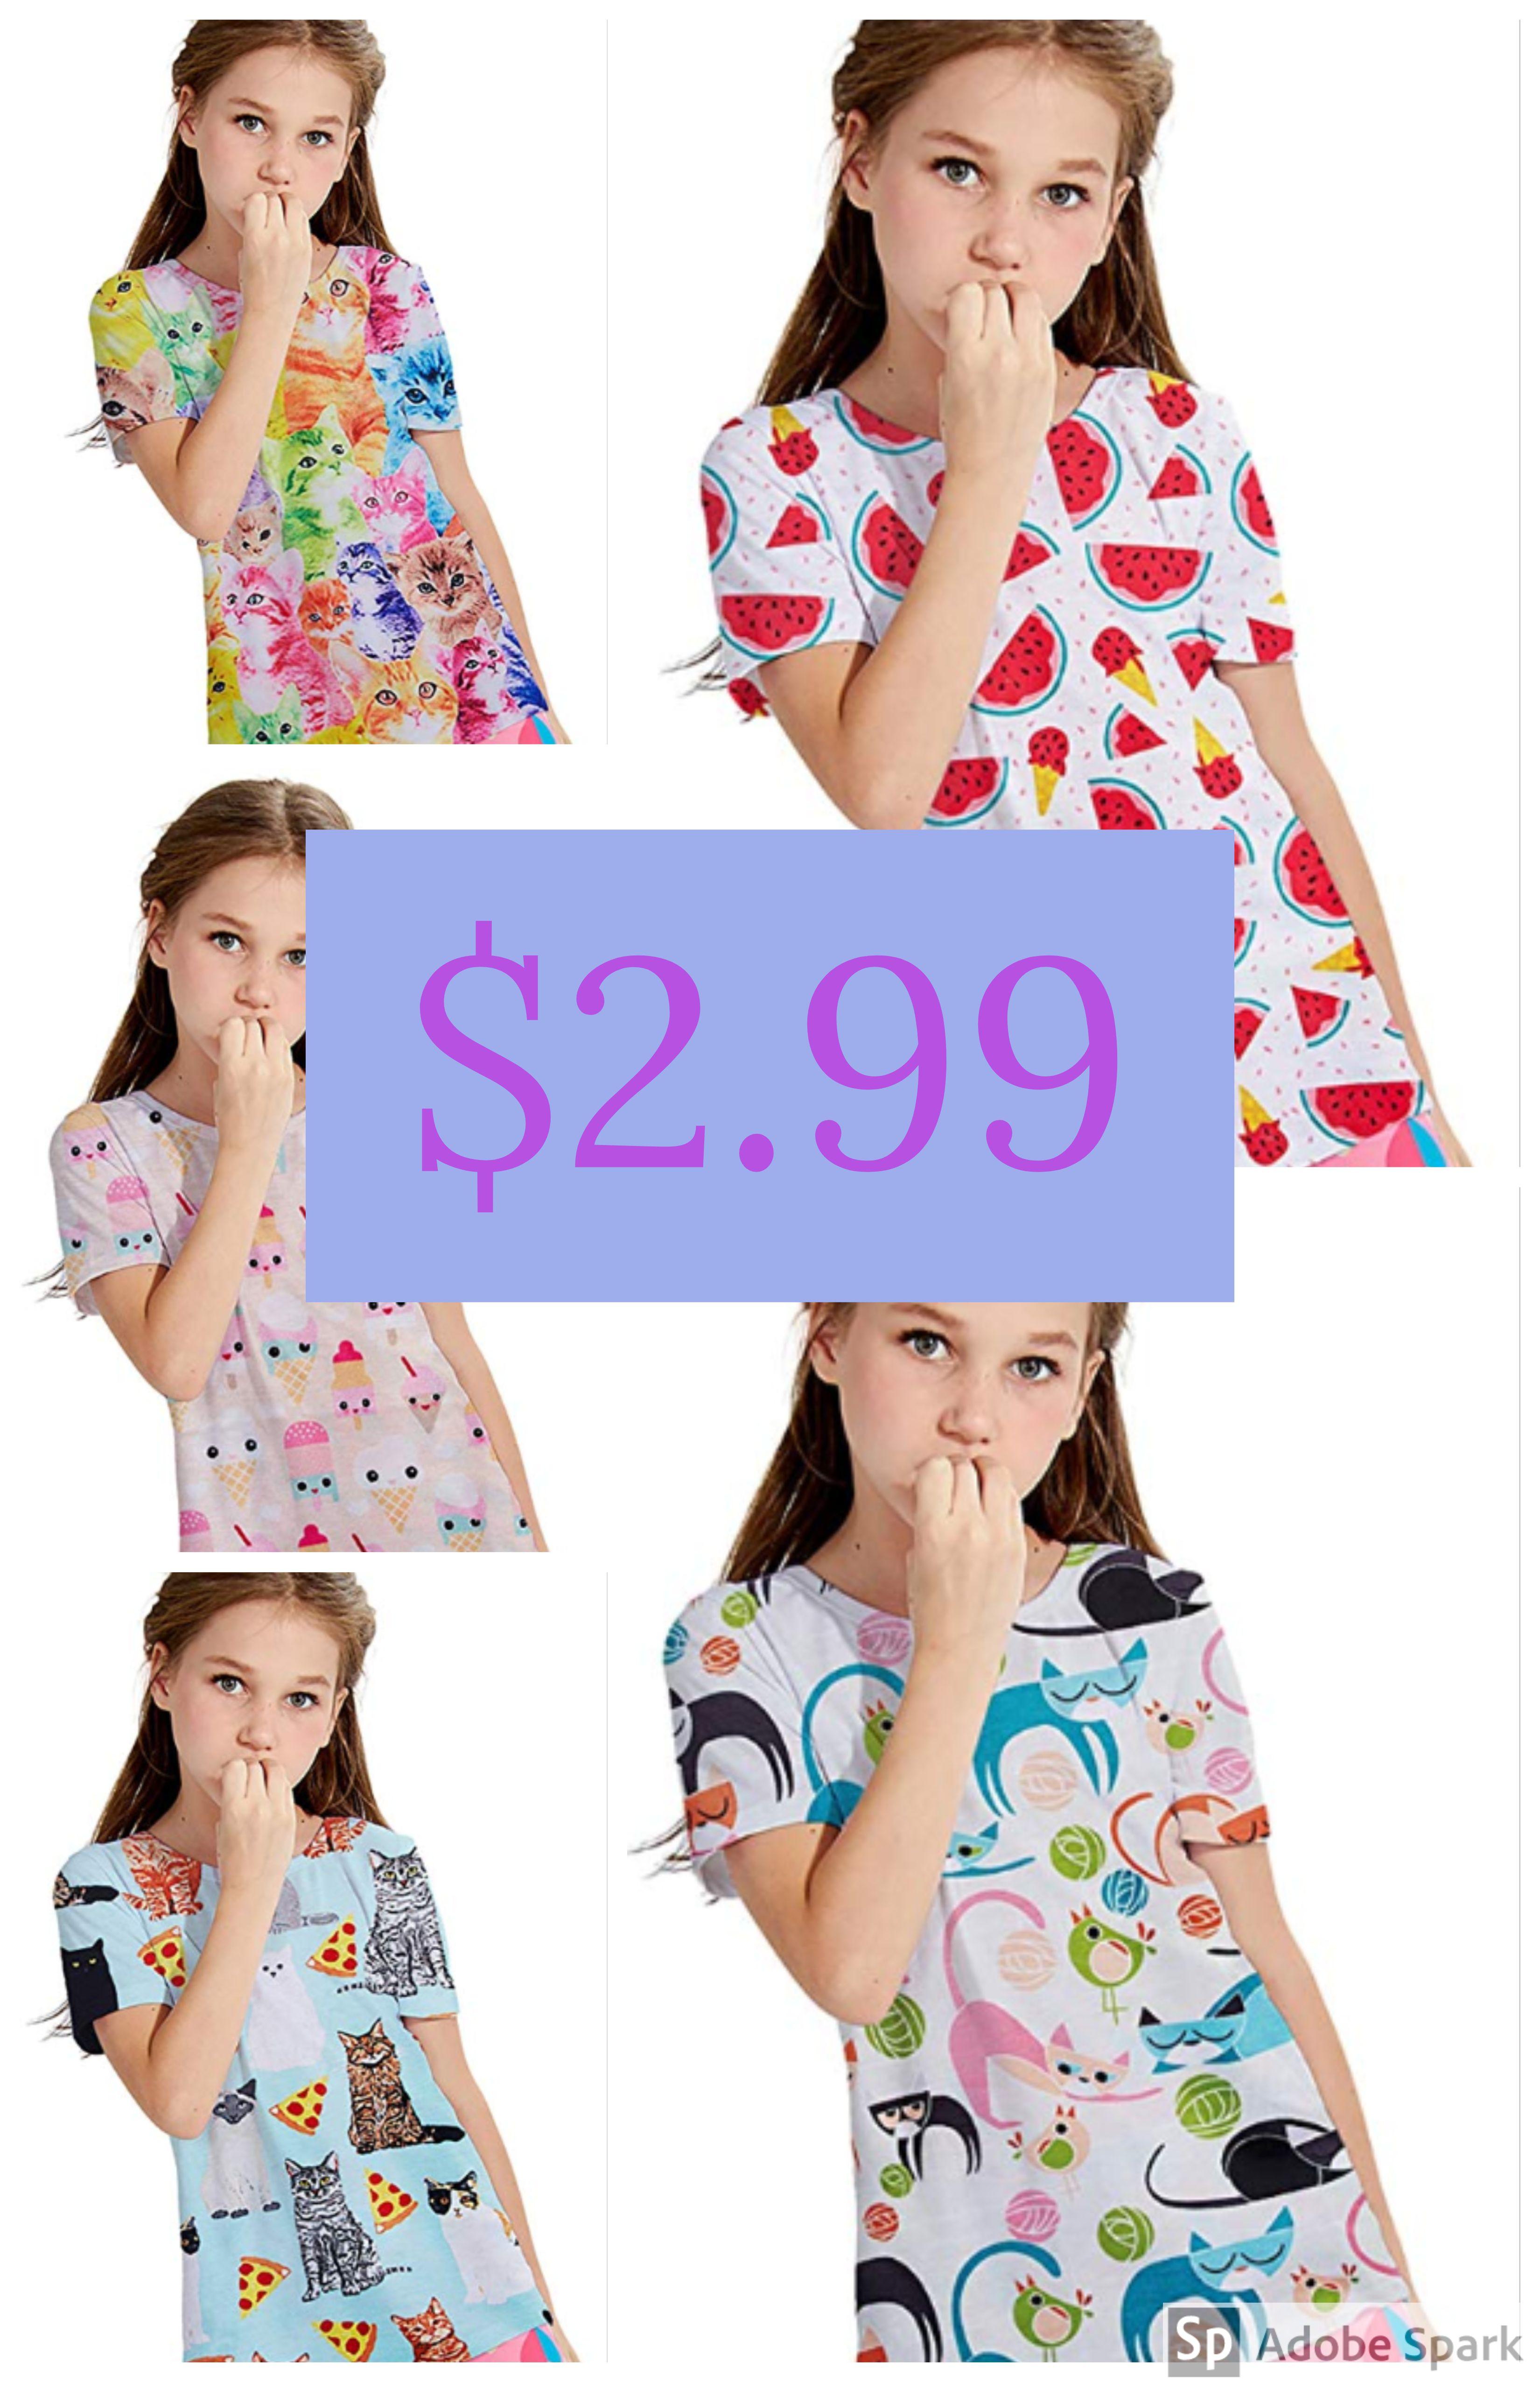 7ad7855cd5ccf Amazon : Baby Girls Cartoon Print Pajamas Top Just $2.99 W/Code (Reg :  $9.99) (As of 8/3/2018 12.02 AM CDT)